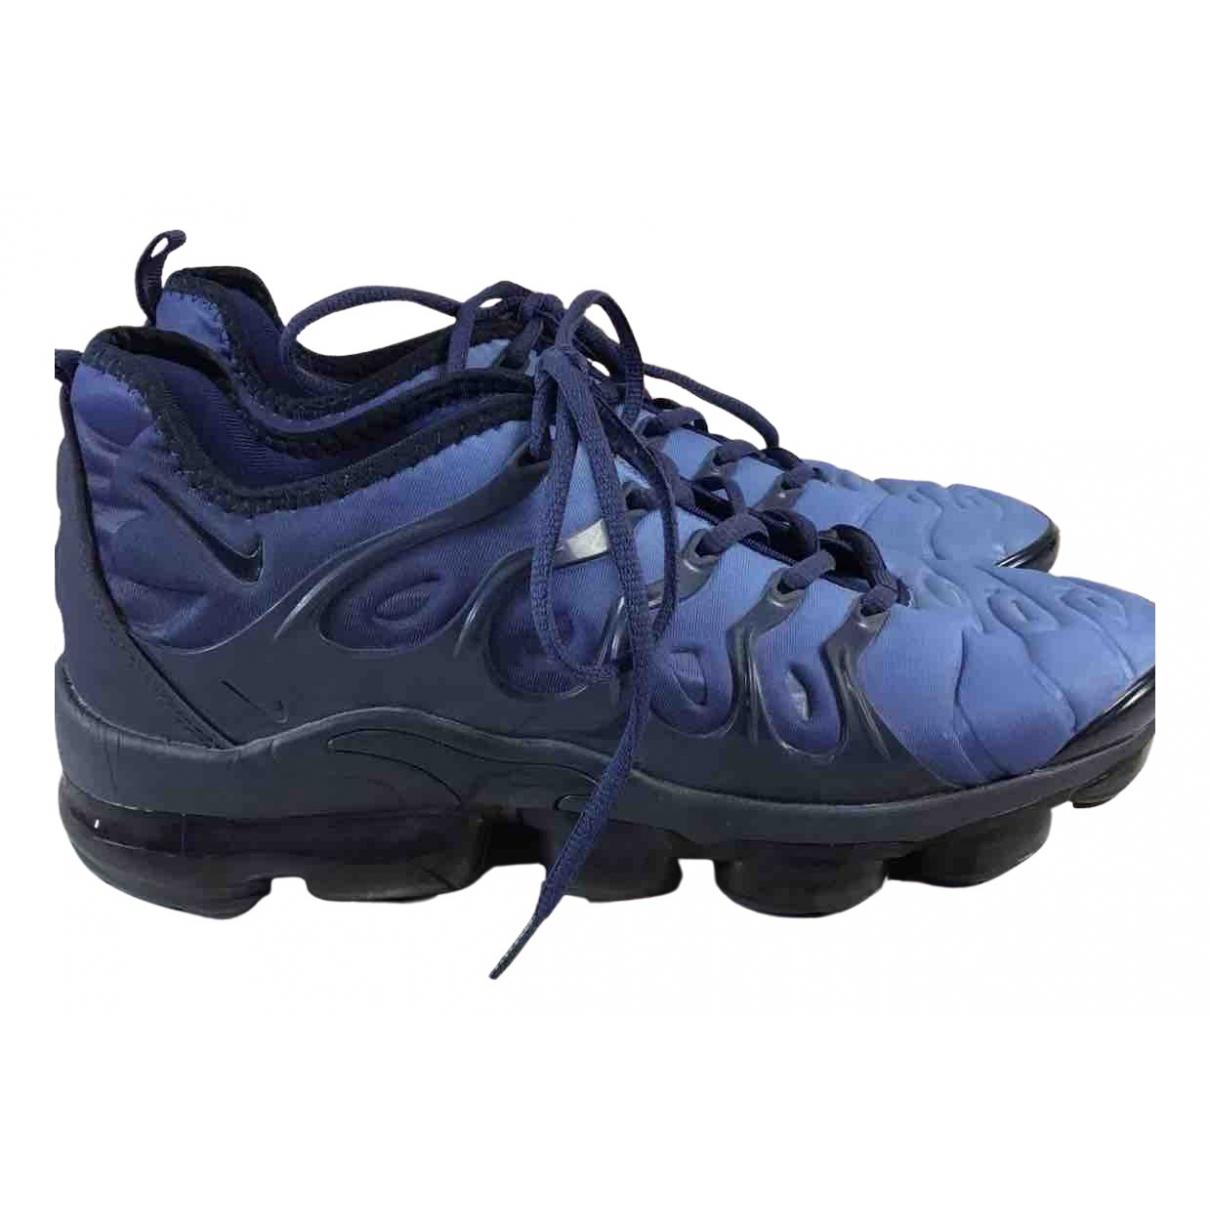 Nike VaporMax Plus Sneakers in  Blau Leinen